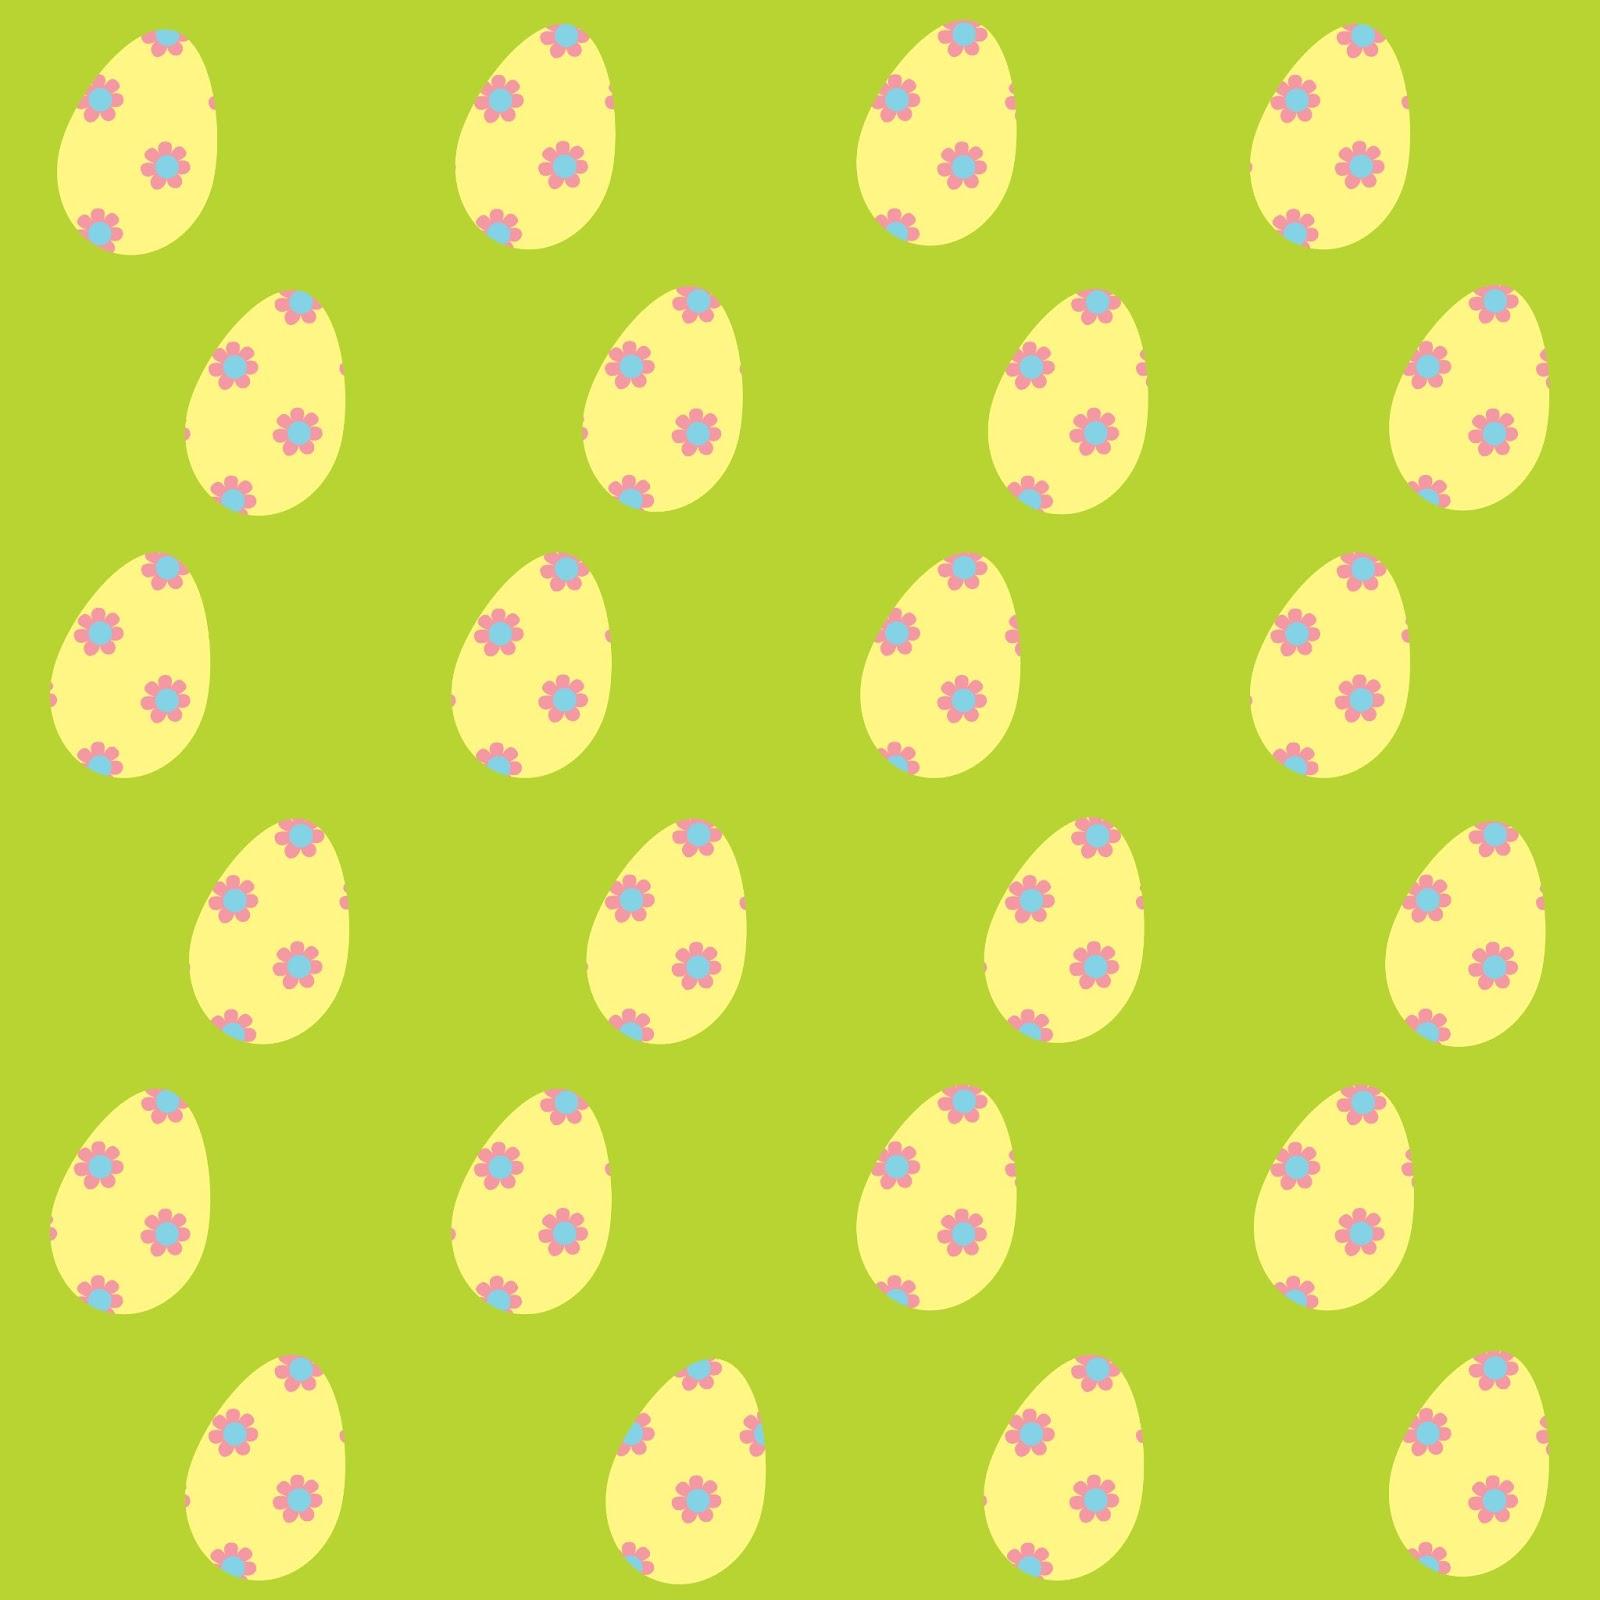 Easter egg design 12x12 printable